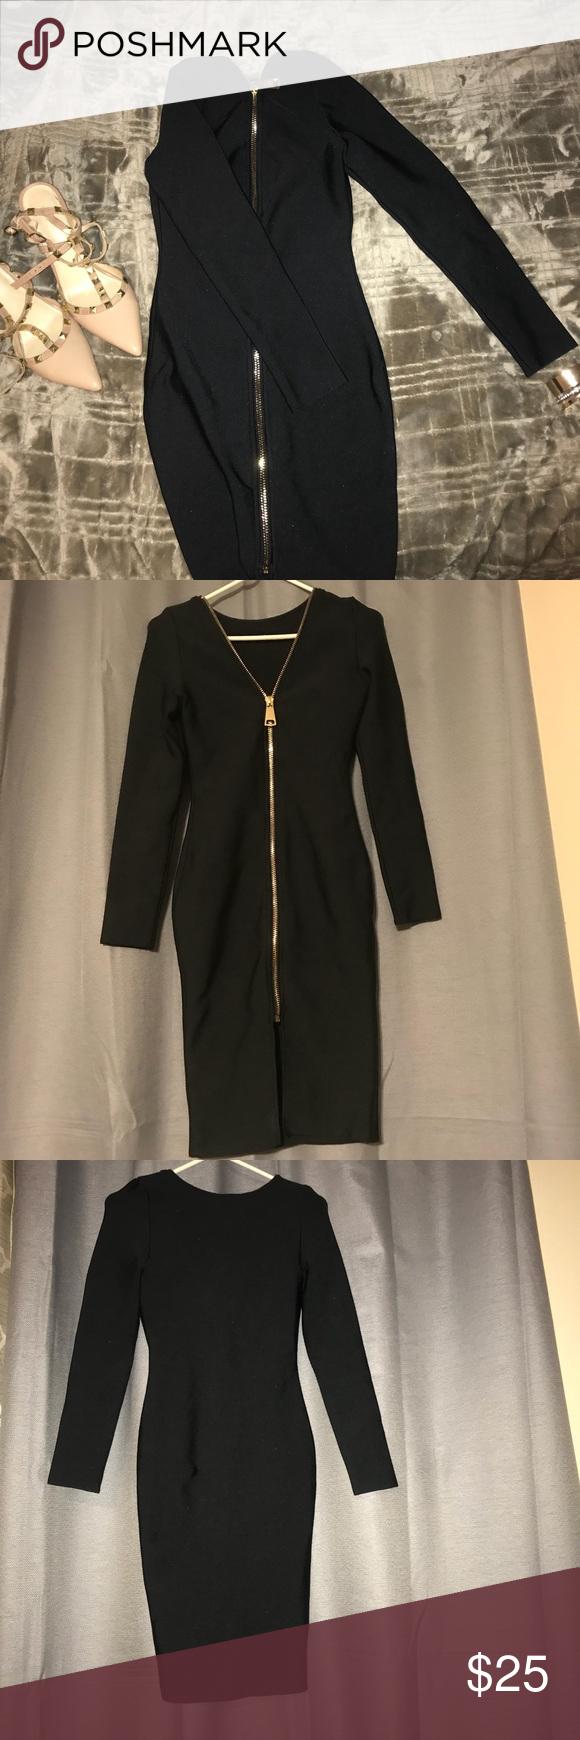 Full zip long sleeve black dress eyes emoji gold gold and emoji